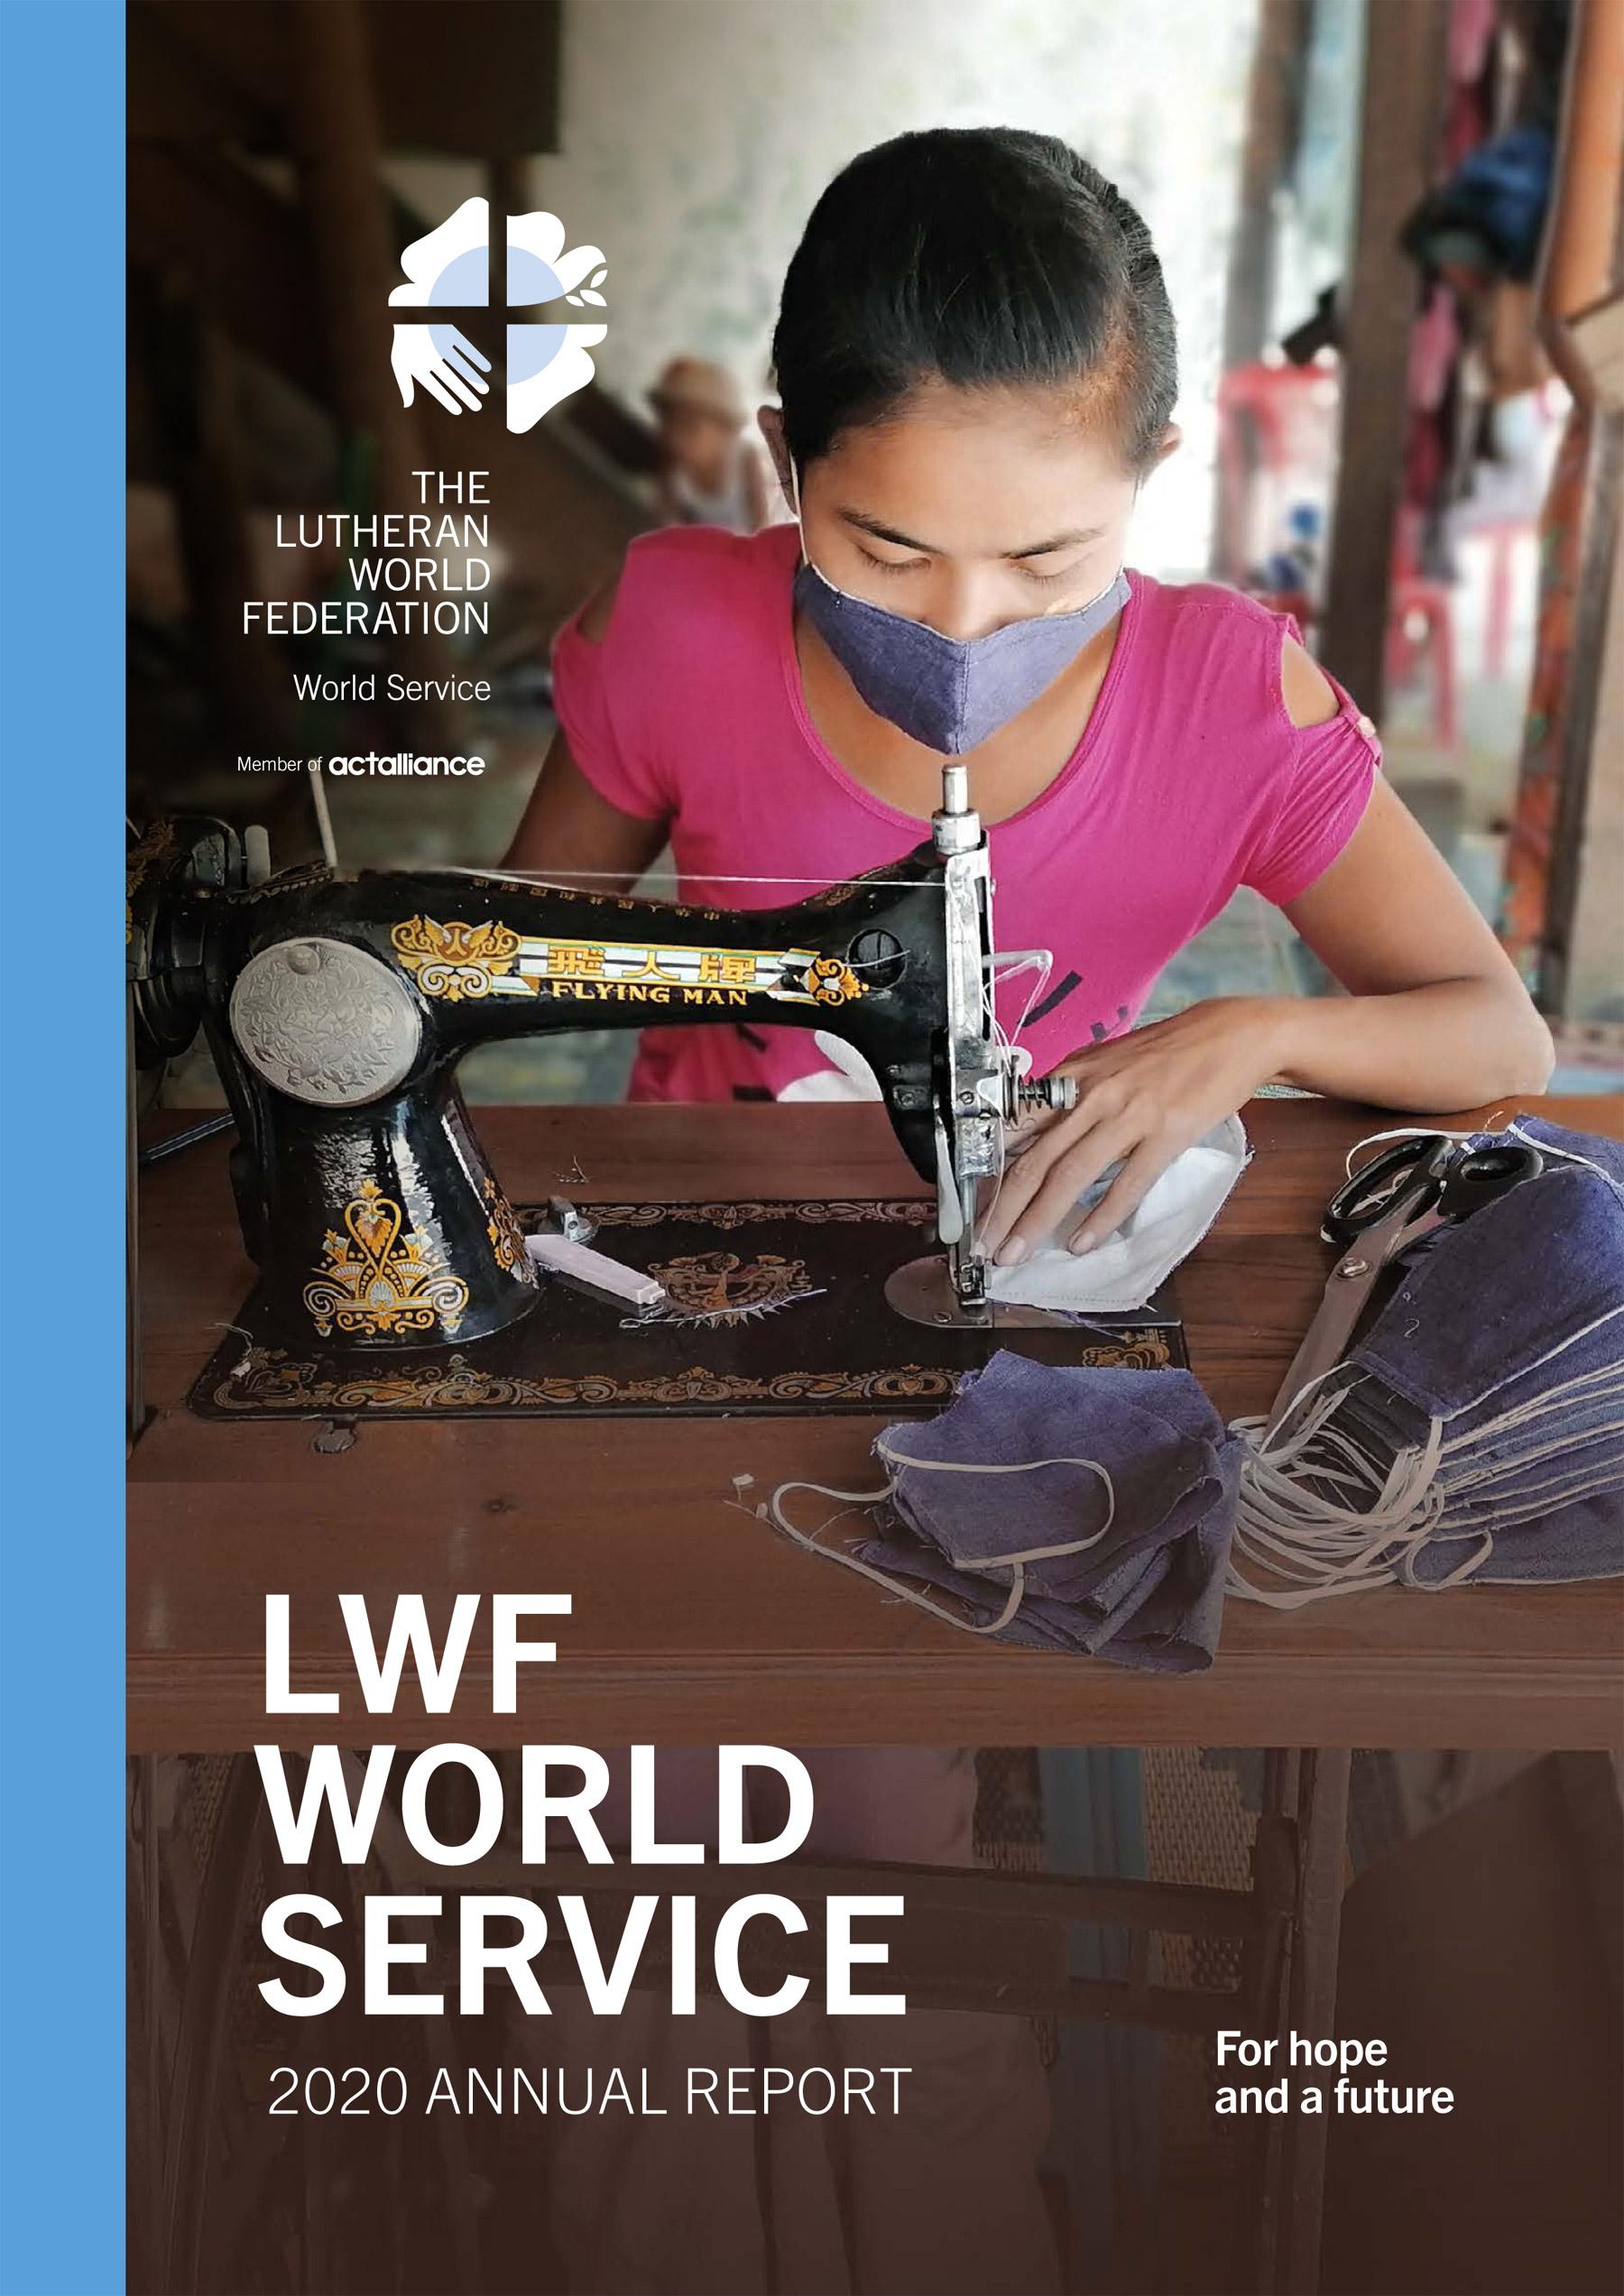 LWF World Service Annual Report 2020